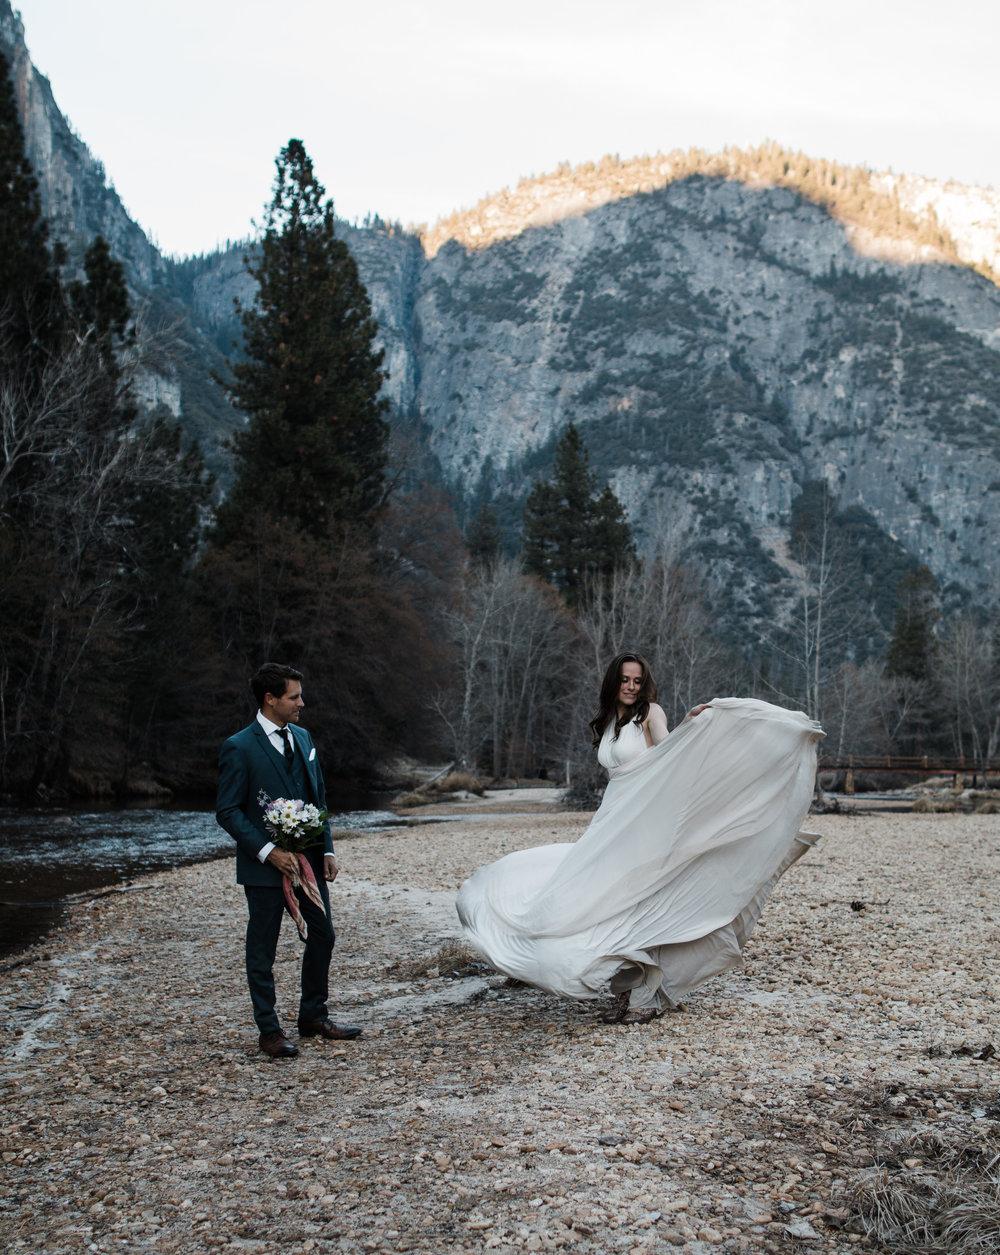 adventure elopement in yosemite national park